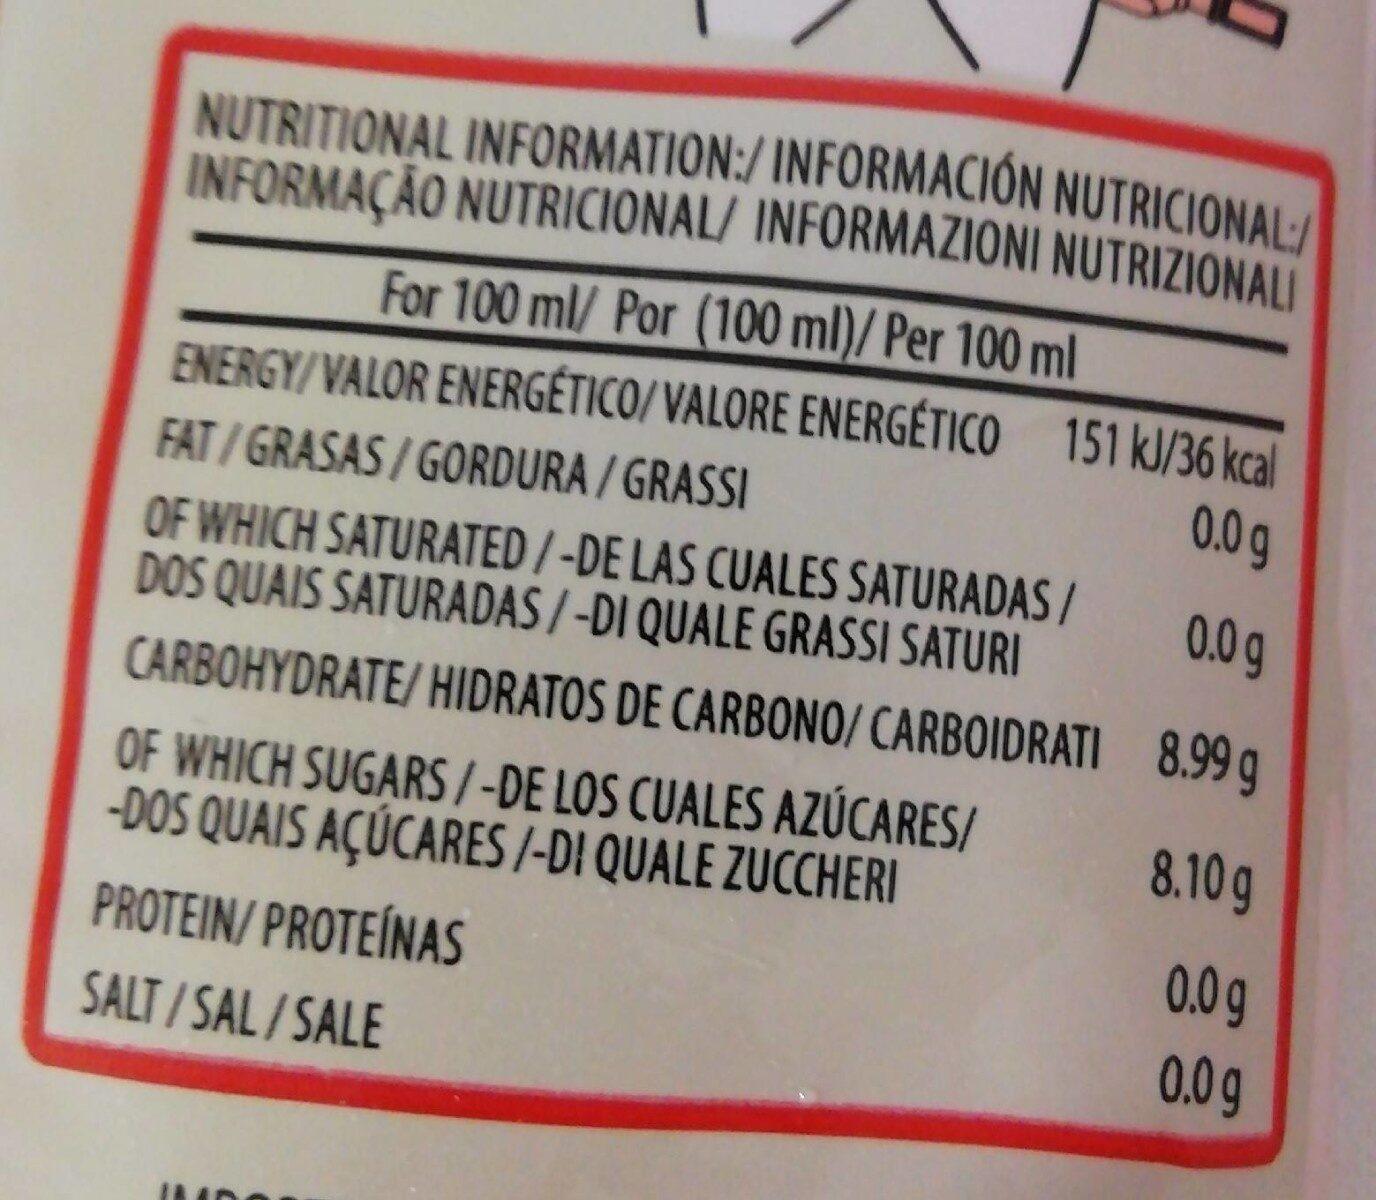 Lap ices - Informació nutricional